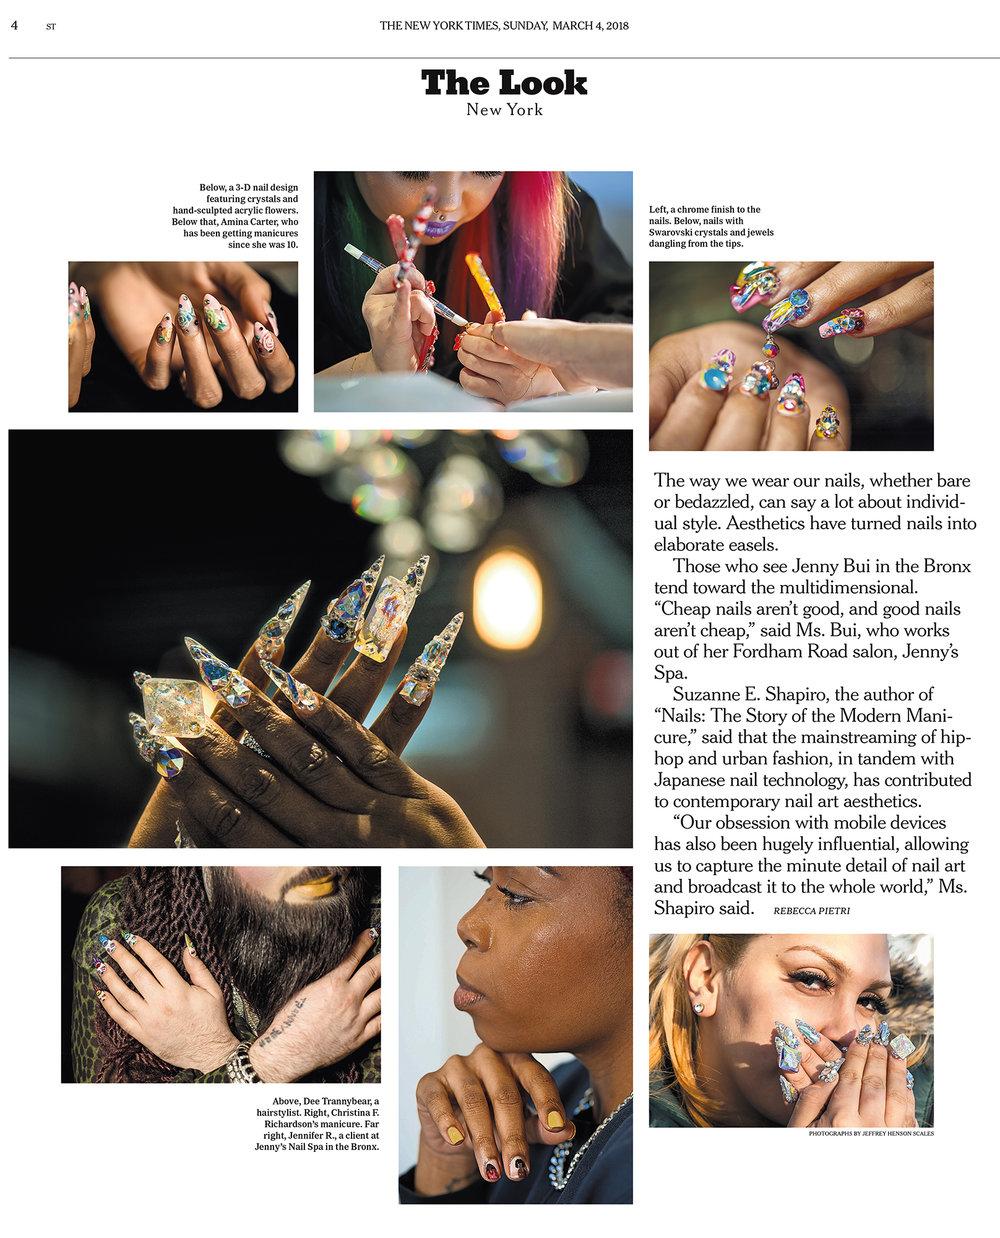 The_New_York_Times_TheNewYorkTimes_THELOOK_The_look_ Style_TakingNewYorkbytheHand_Manicures_Nail_Art_Fashion_Article _Rebecca_Pietri_Writer_Stylist_Casting_JefferyHensonScales_Photographer_EveLyons_Editor.JPG